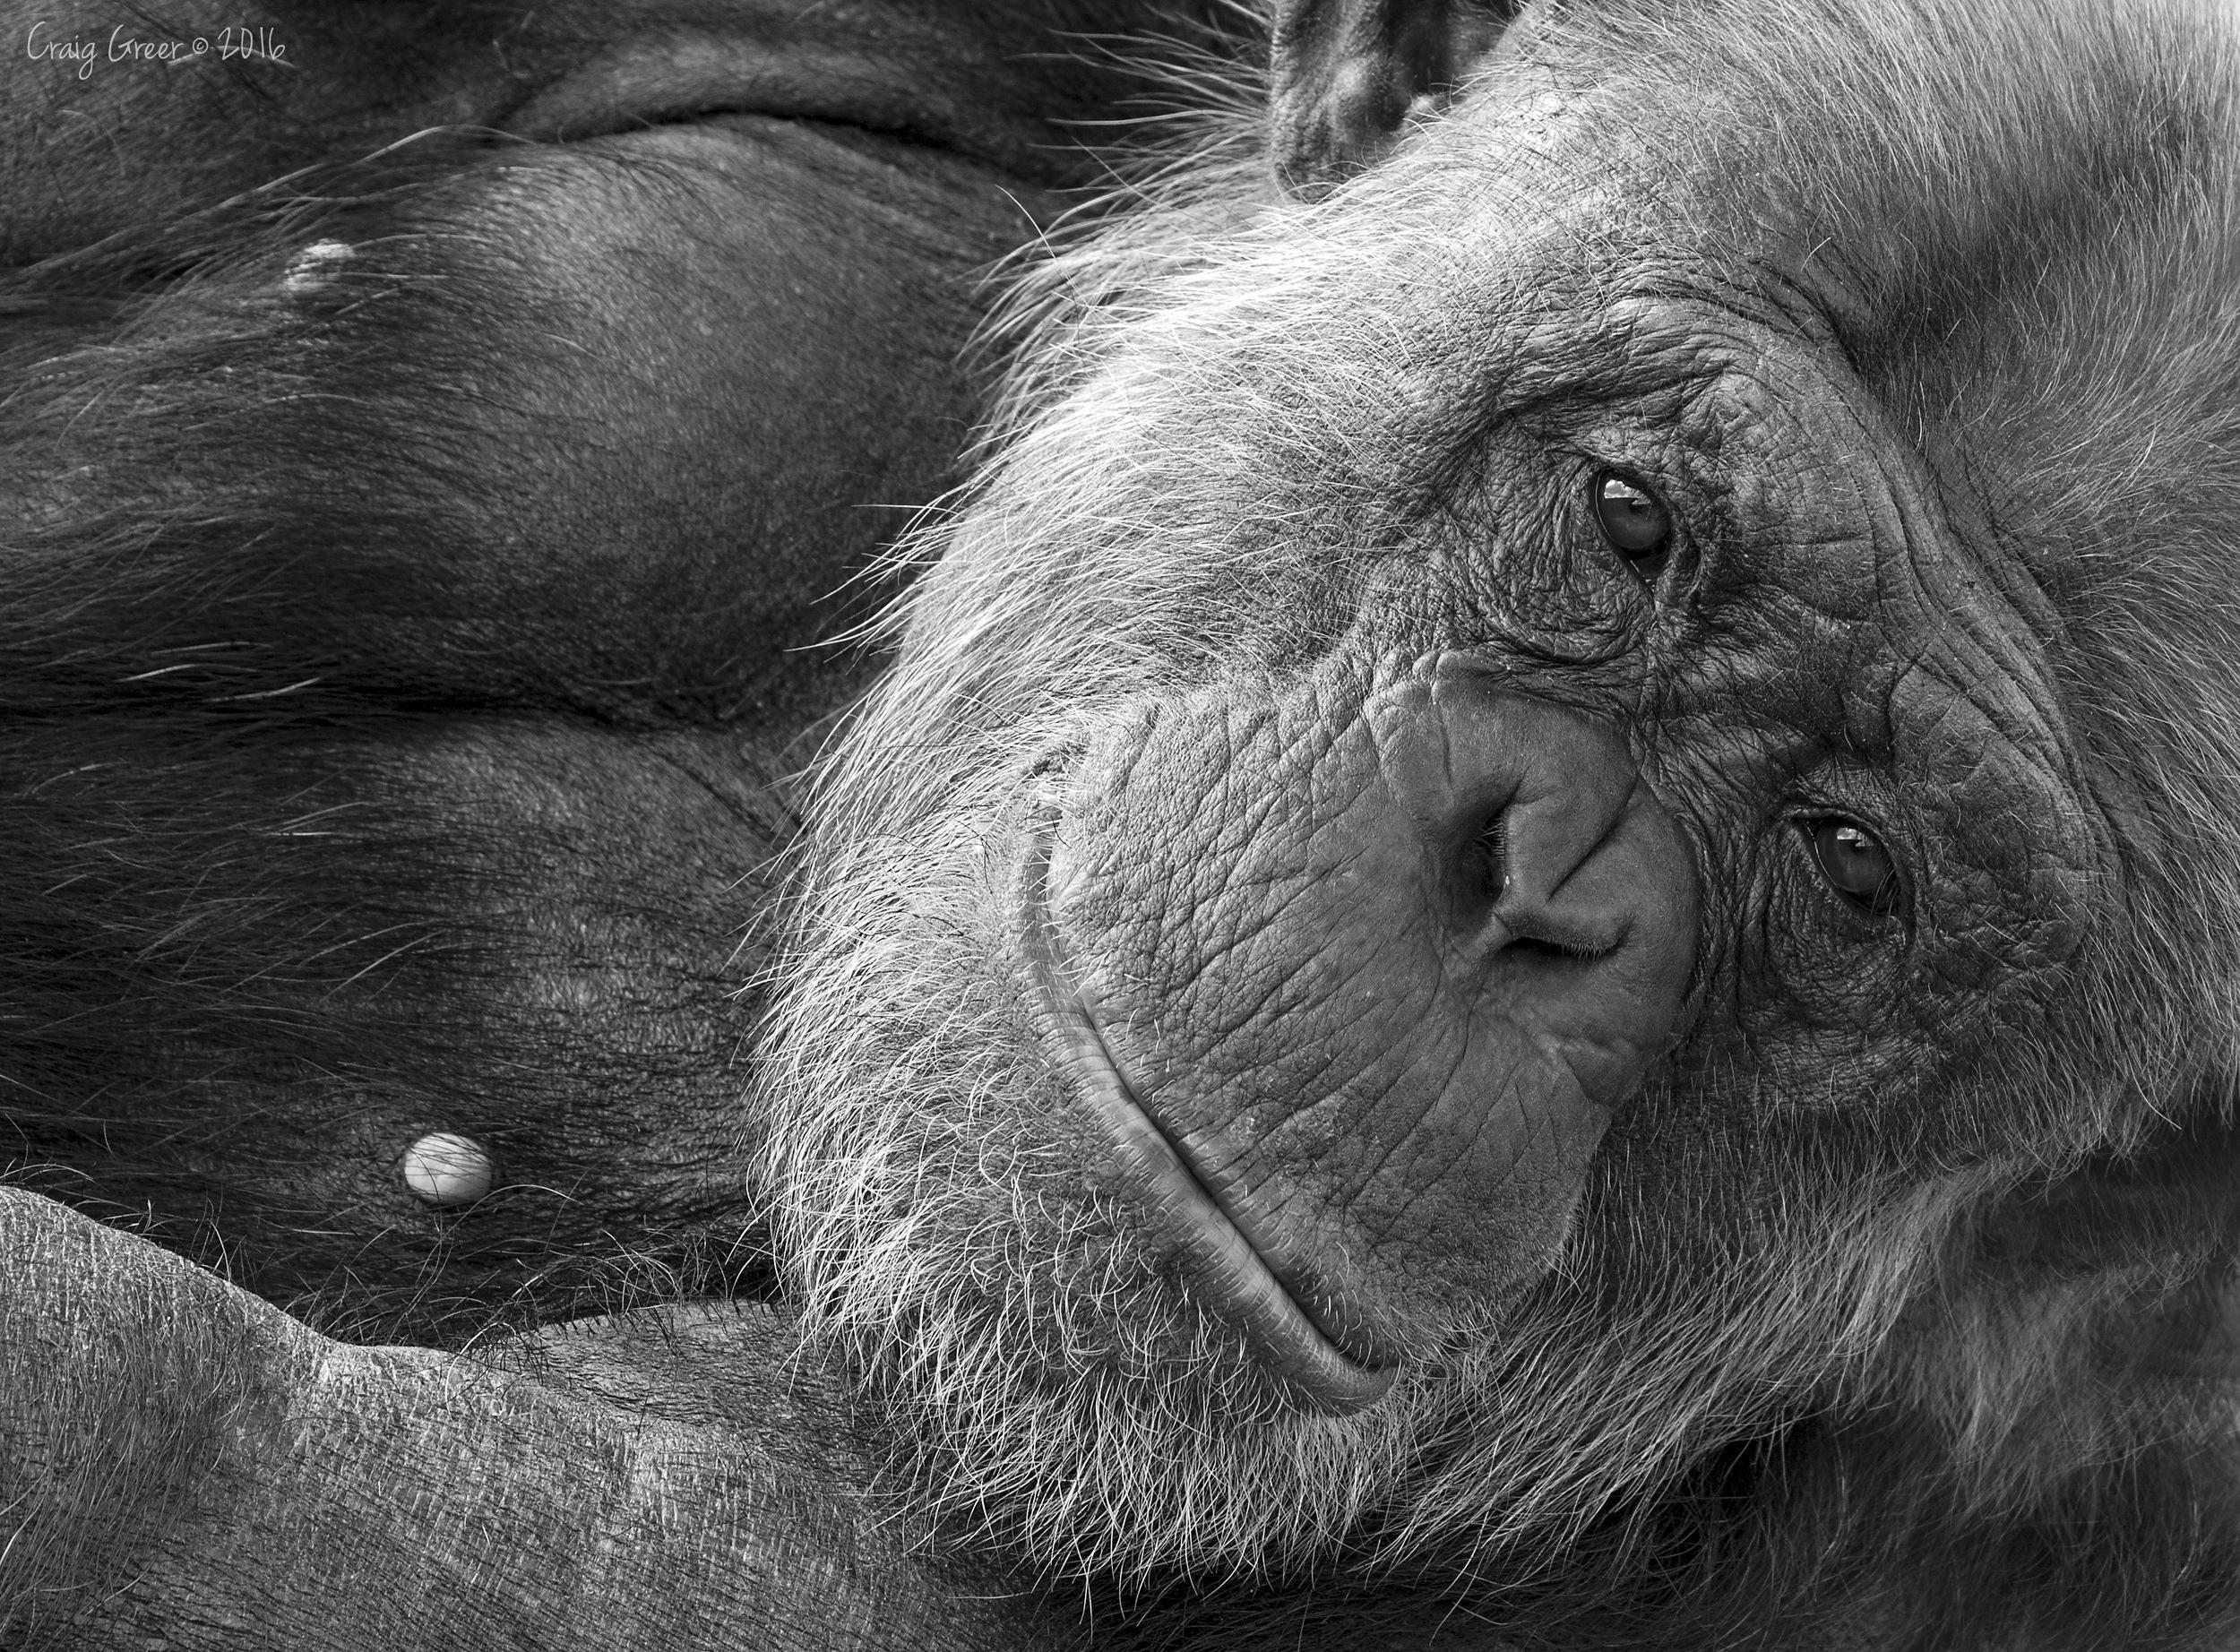 Chimpanzee-2-Monarto-Zoo-19-03-16.jpg